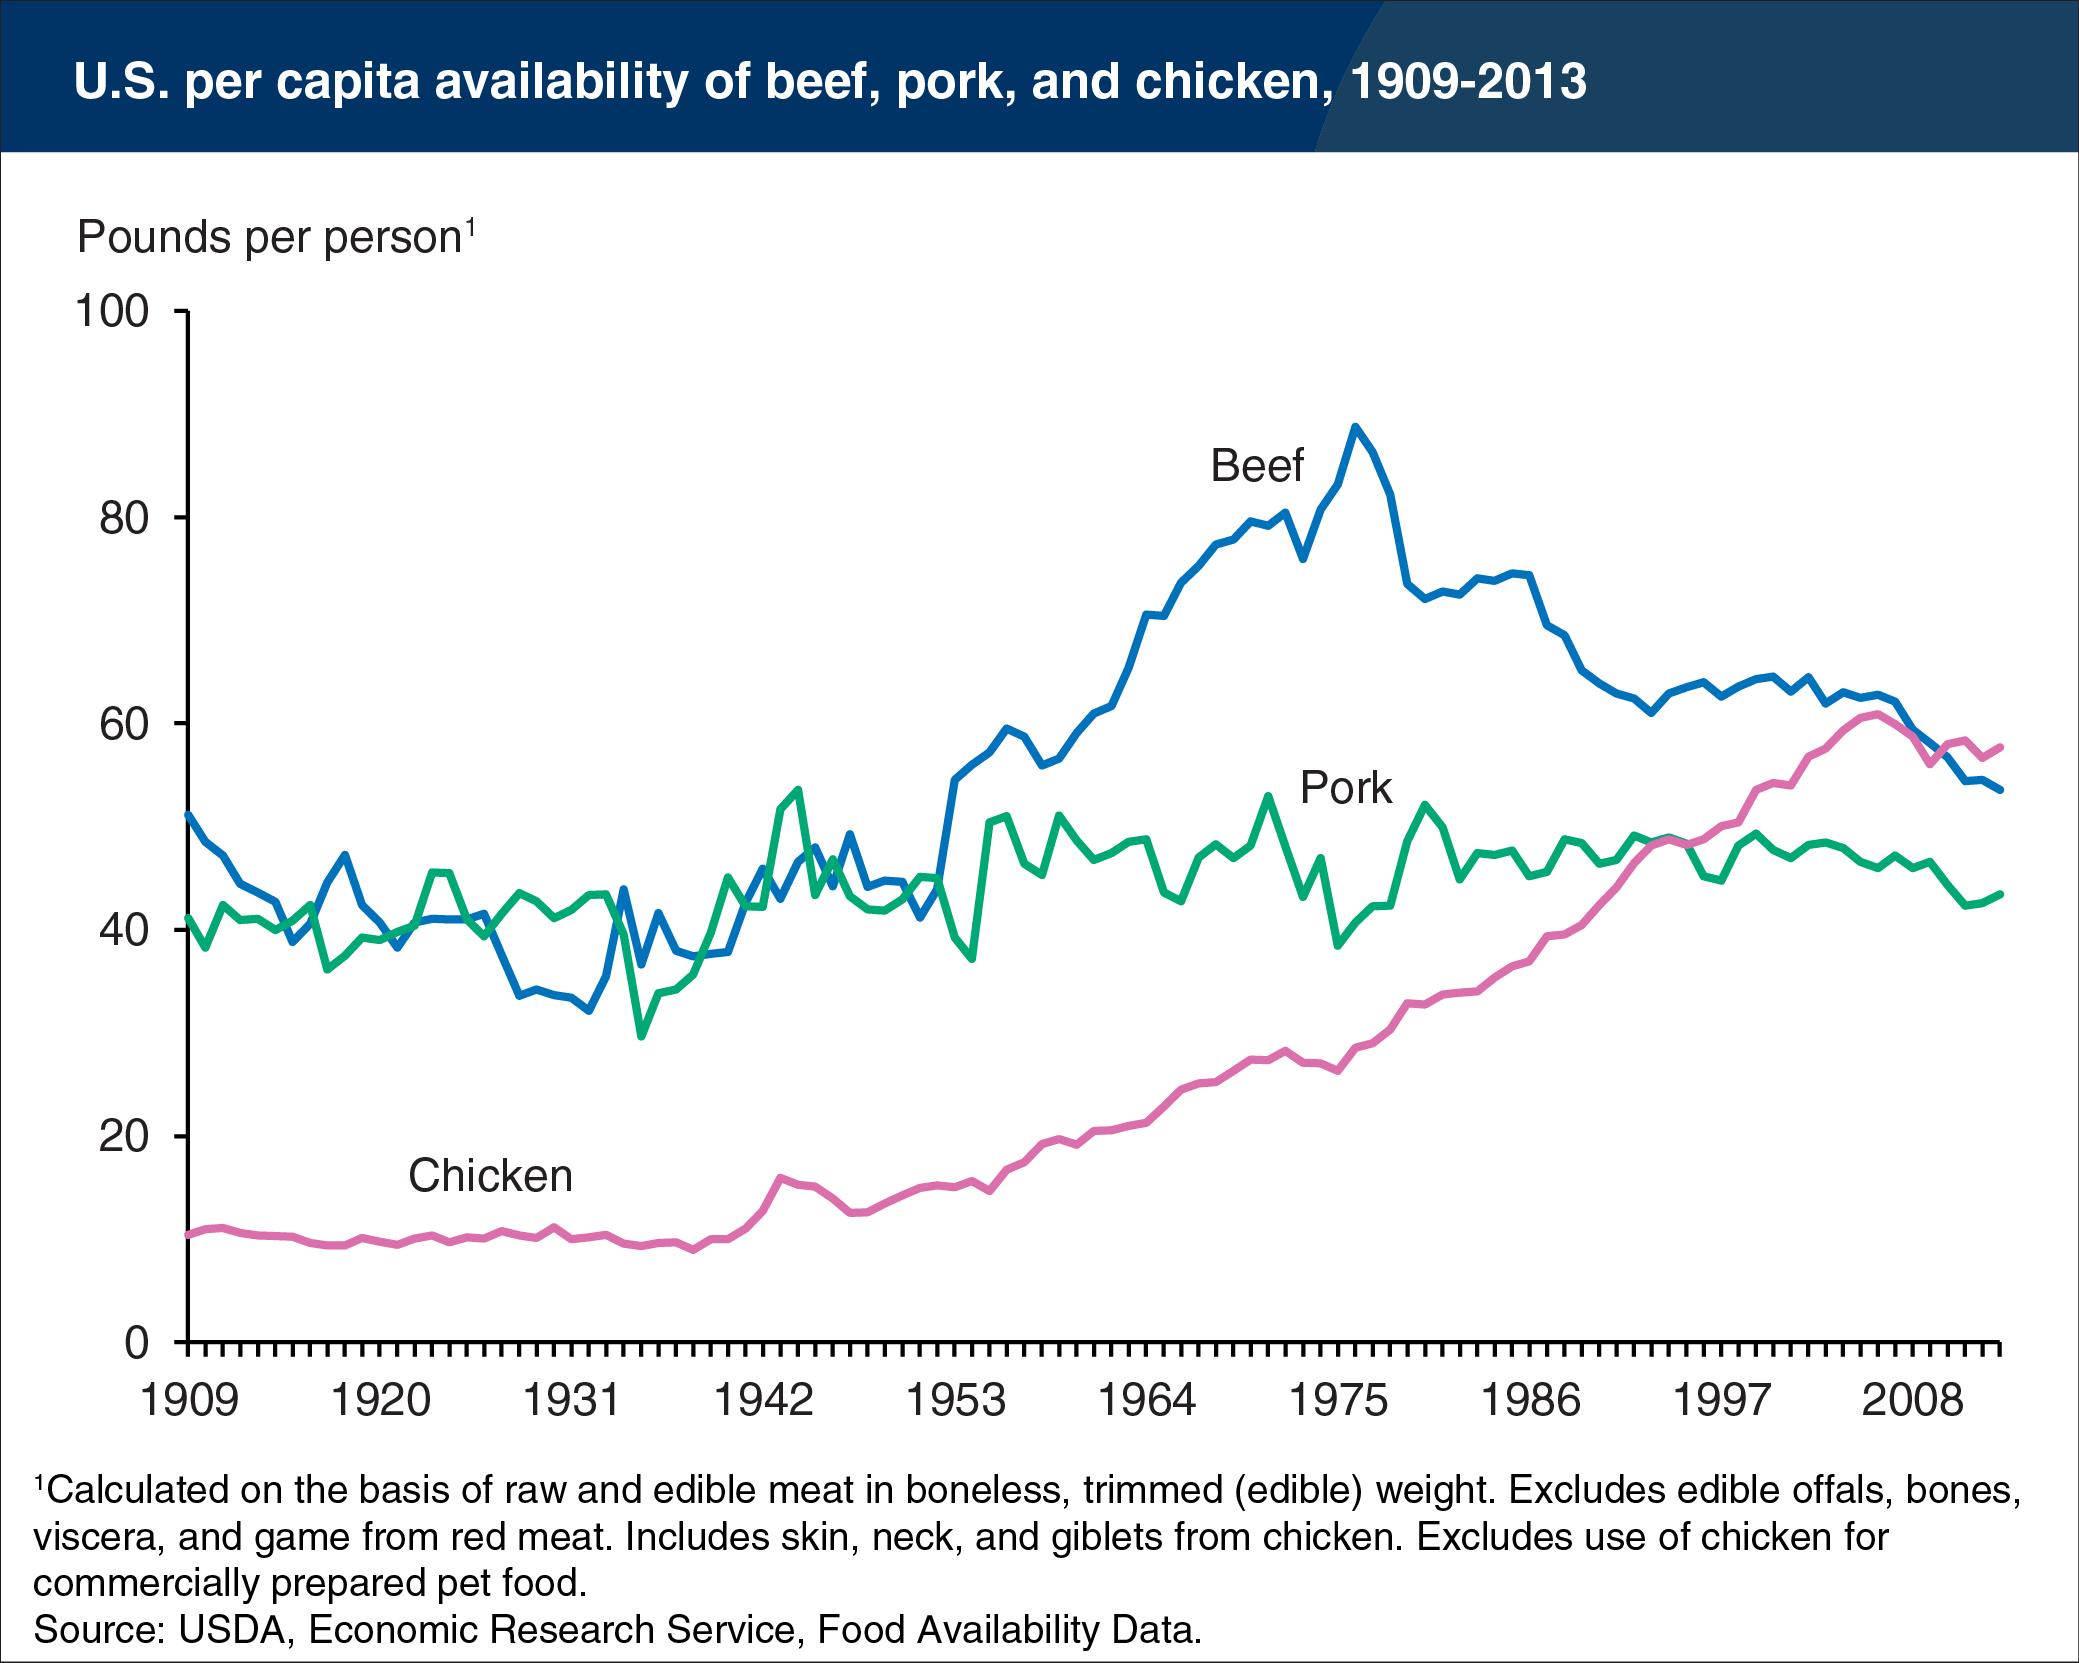 https://www.ers.usda.gov/webdocs/charts/62884/meat-availability.png?v=42394